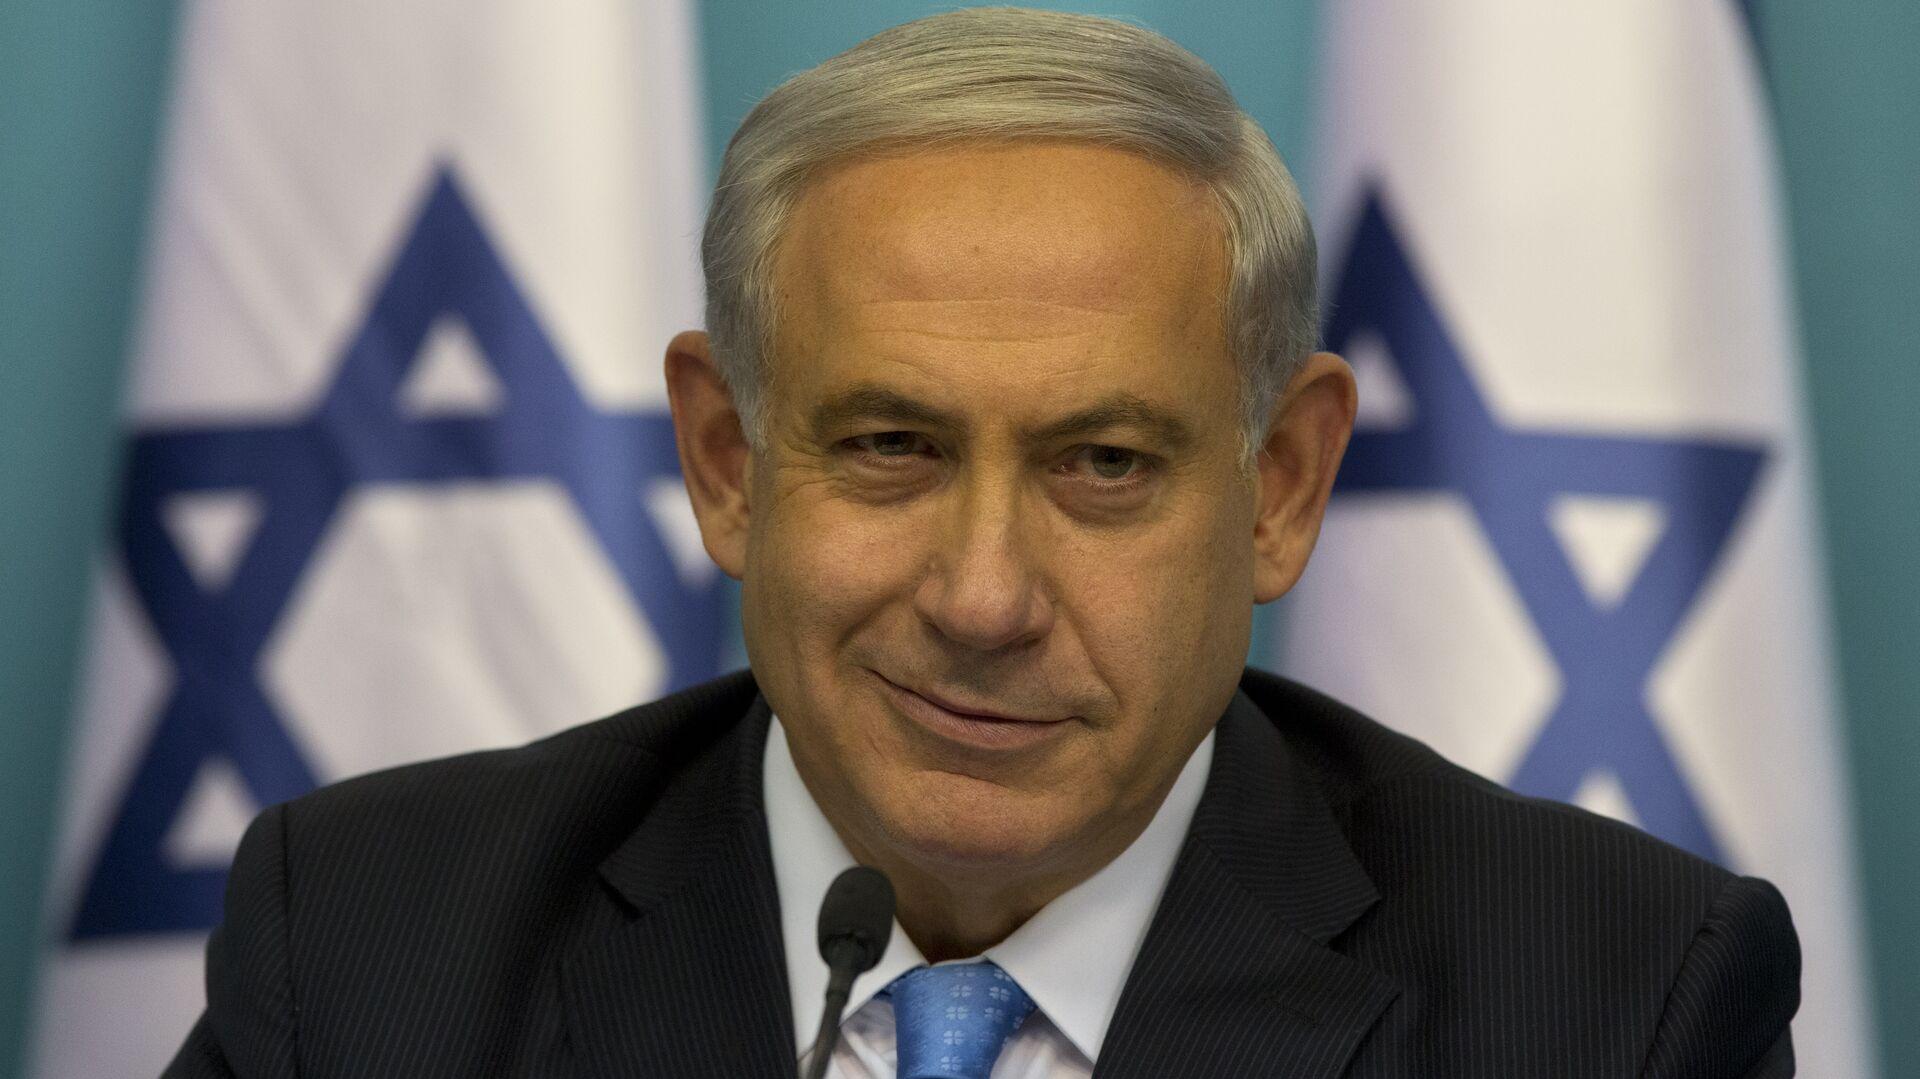 Benjamín Netanyahu, primer ministro de Israel - Sputnik Mundo, 1920, 06.04.2021